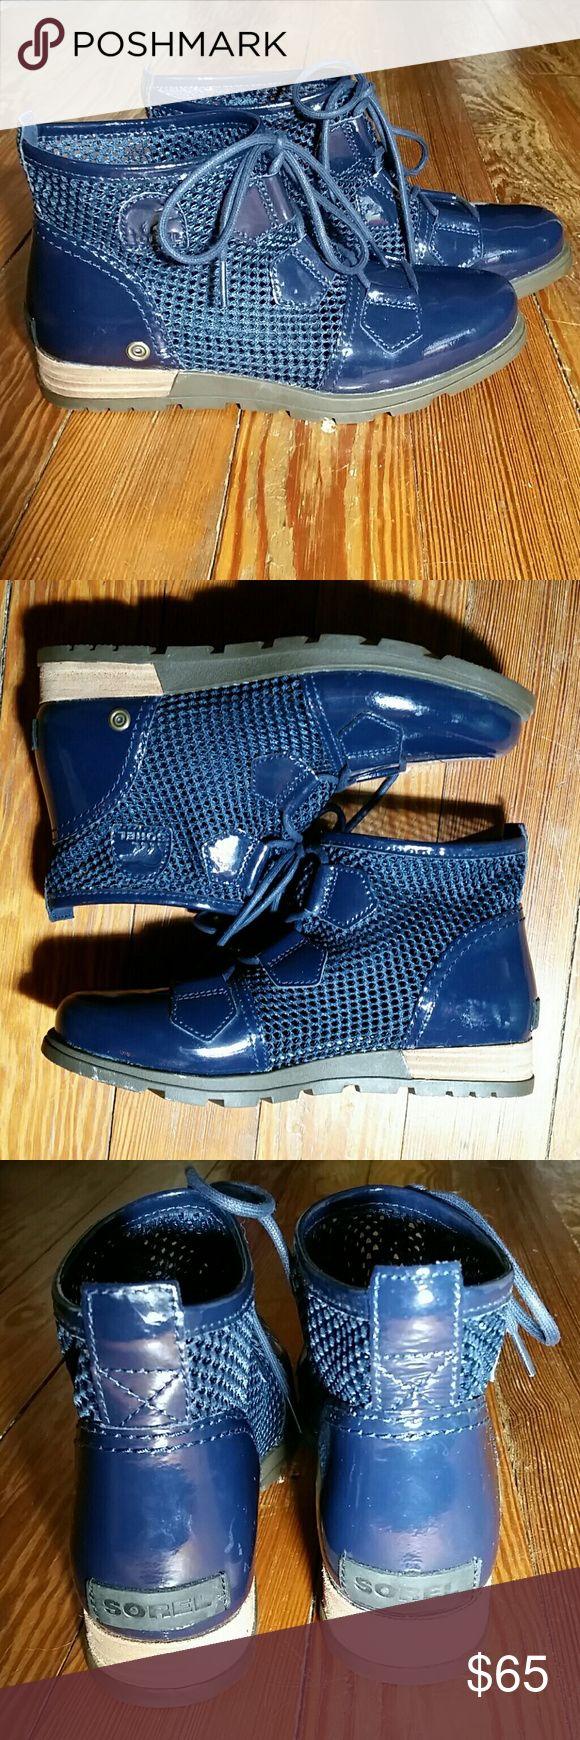 NEW Sorel Major Mesh Boots NWOT, Sorel  Major Mesh Boots, Navy, Size 6.5, Never worn Sorel Shoes Winter & Rain Boots